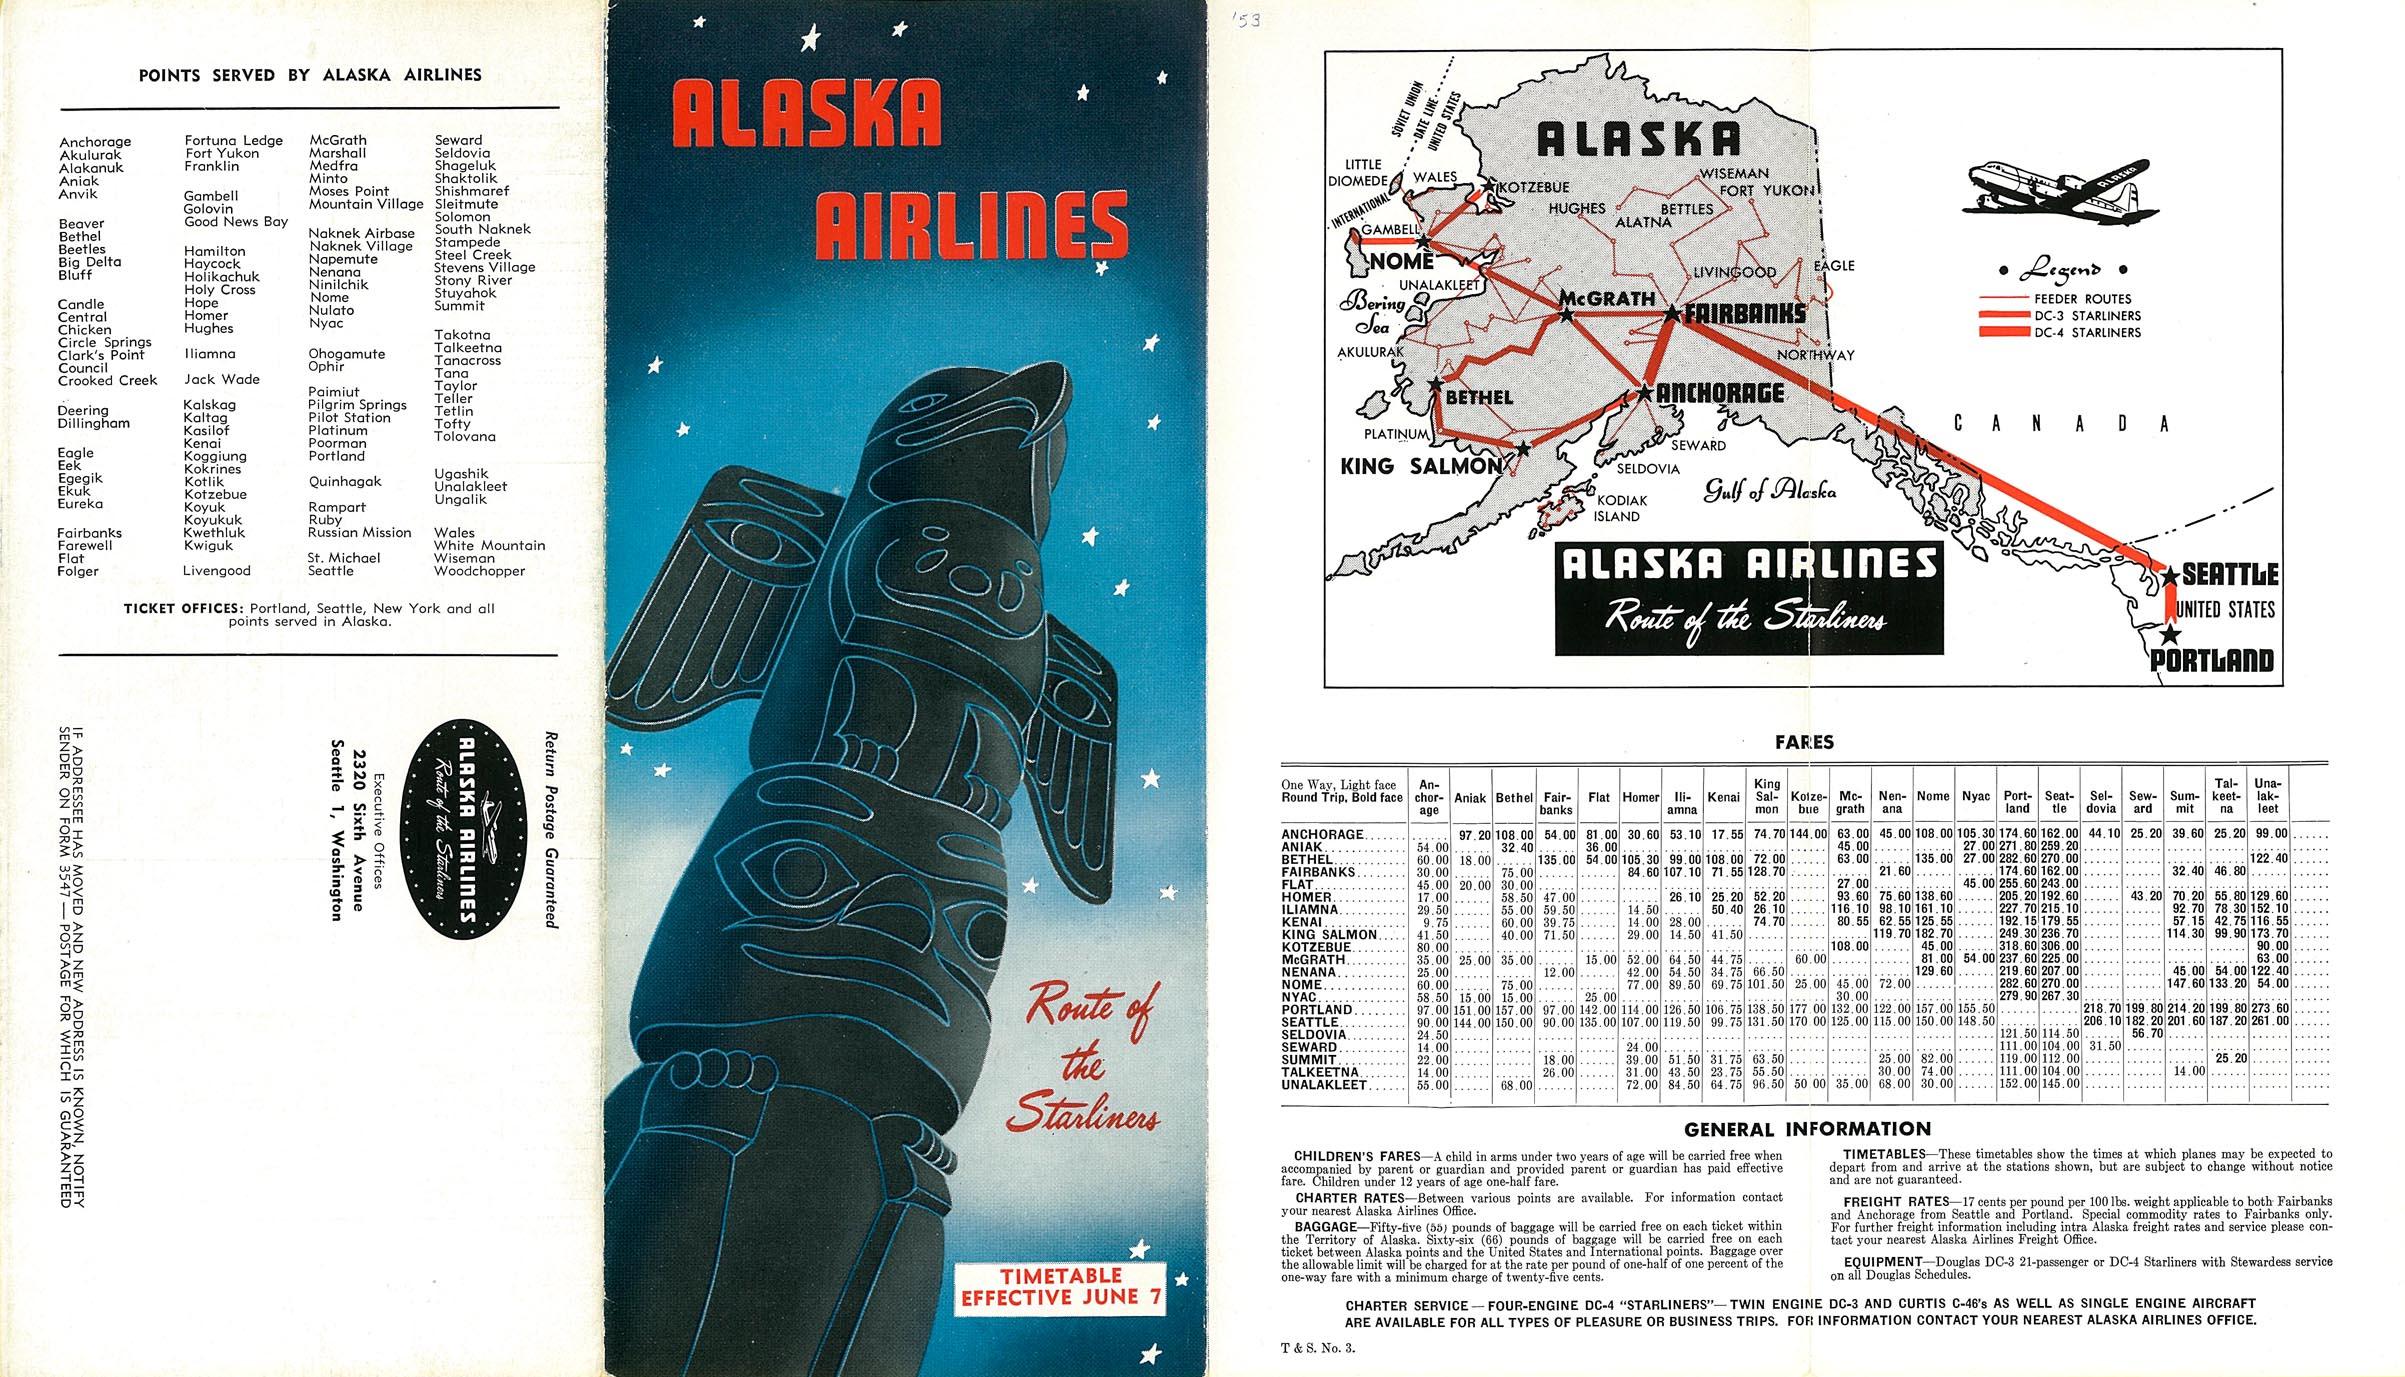 aegean airlines timetable 2017 pdf